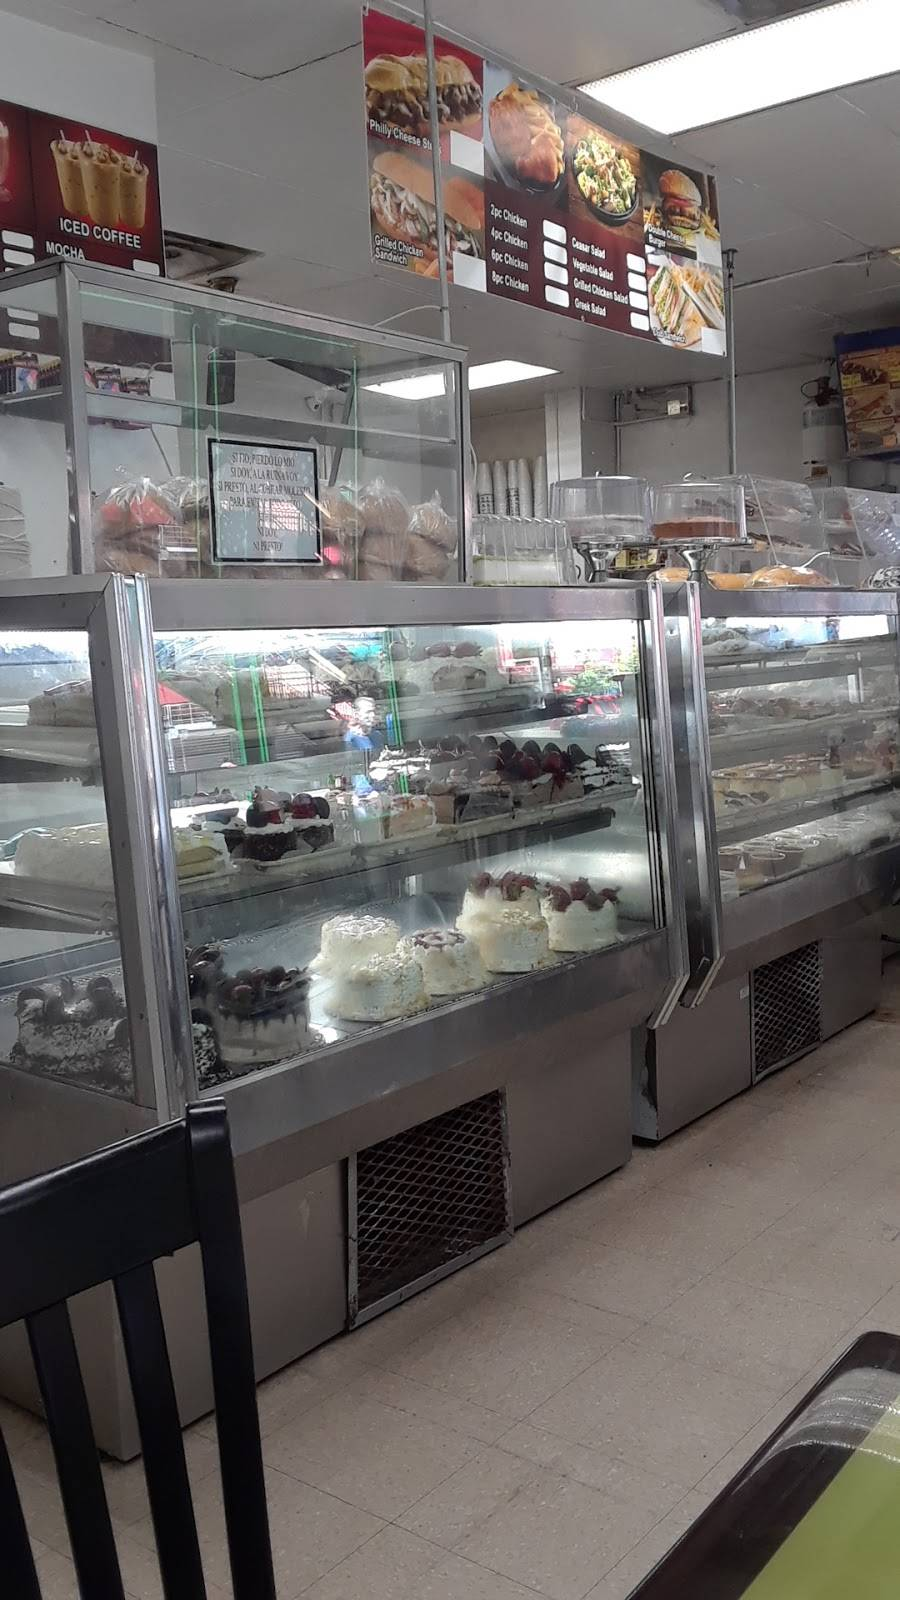 Running Cool Restaurant | restaurant | 2263 Jerome Ave, Bronx, NY 10453, USA | 7185626648 OR +1 718-562-6648